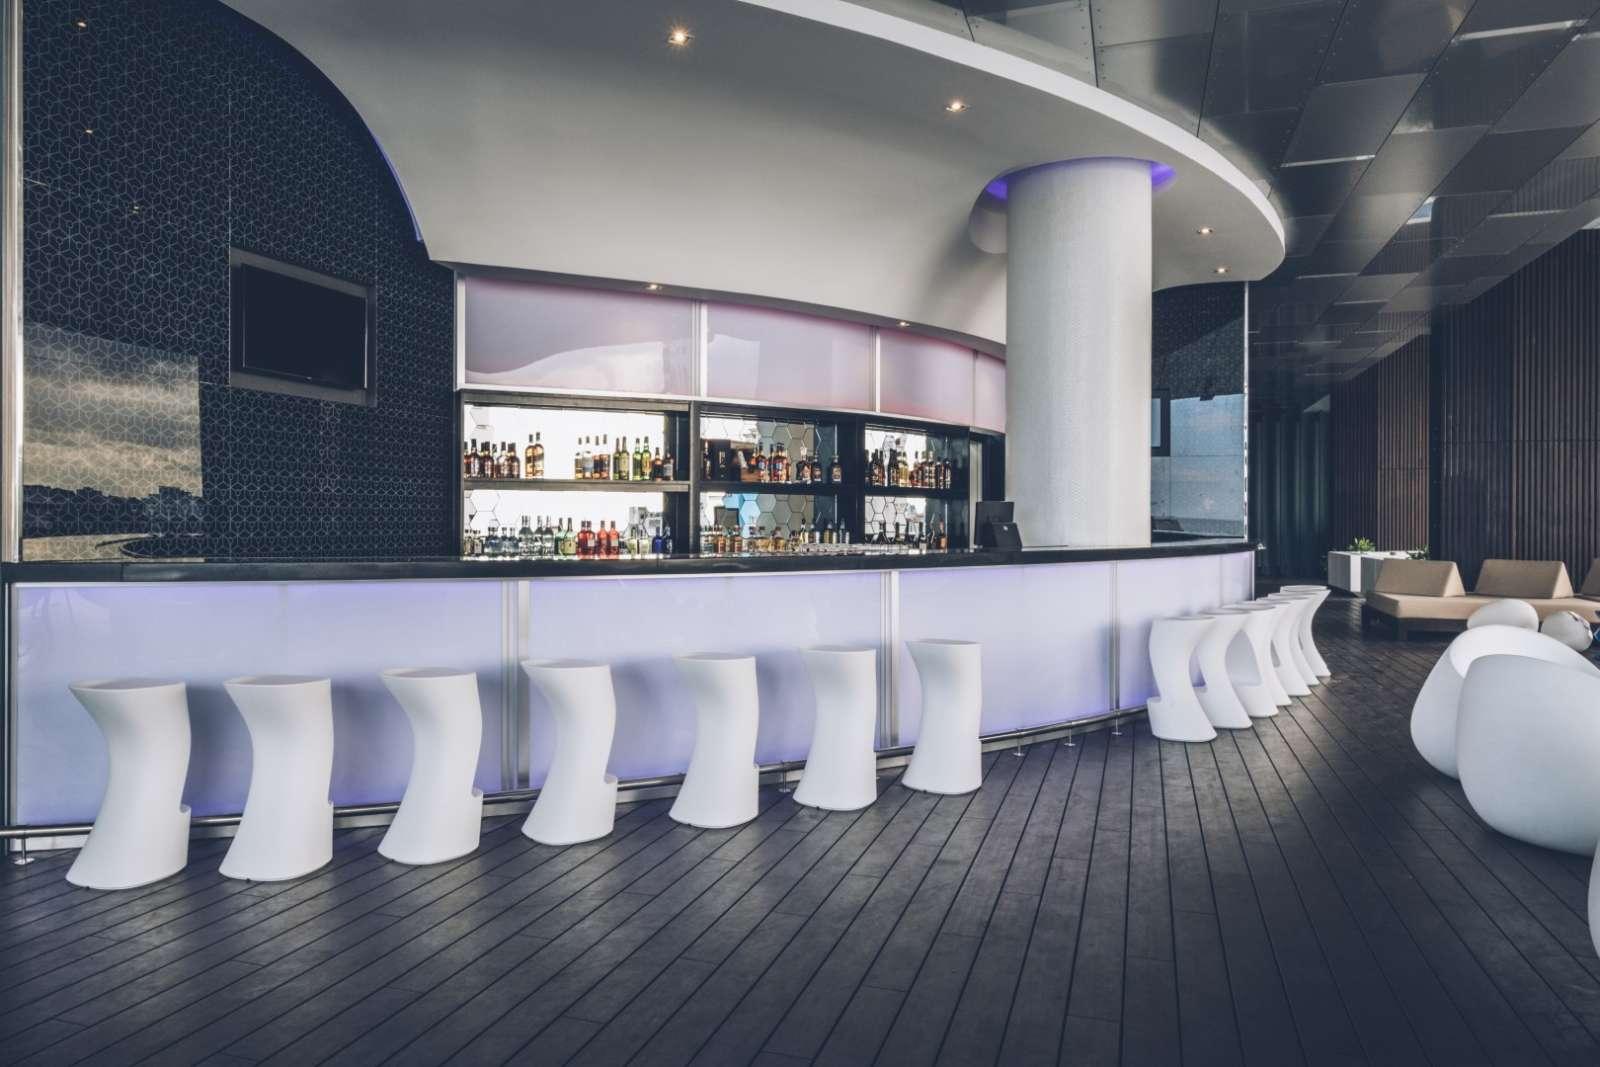 Pool bar seating at the Iberostar Packard hotel in Havana, Cuba